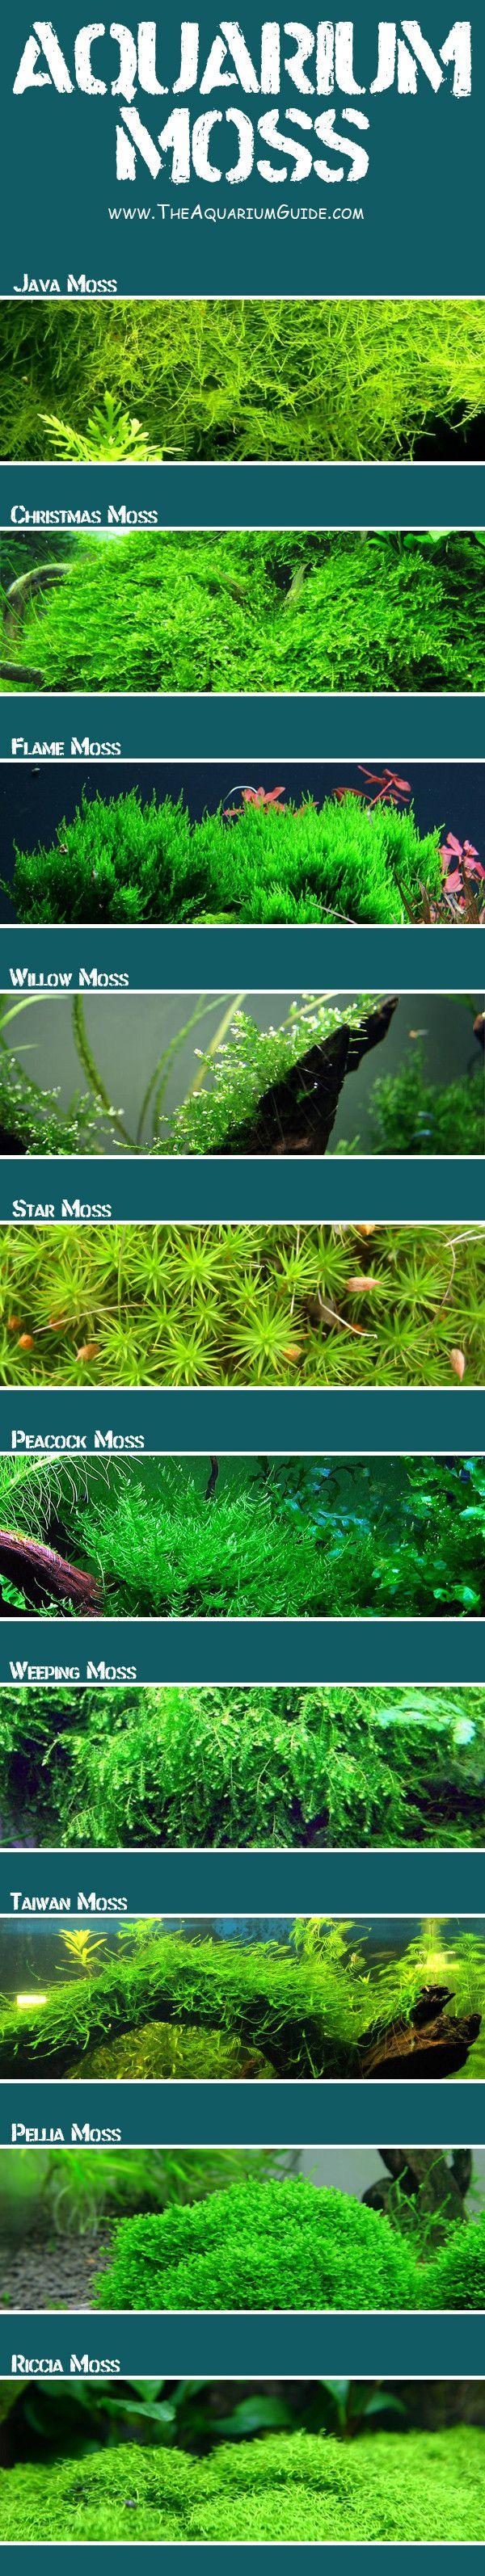 Freshwater aquarium fish compatibility chart - Aquarium Moss